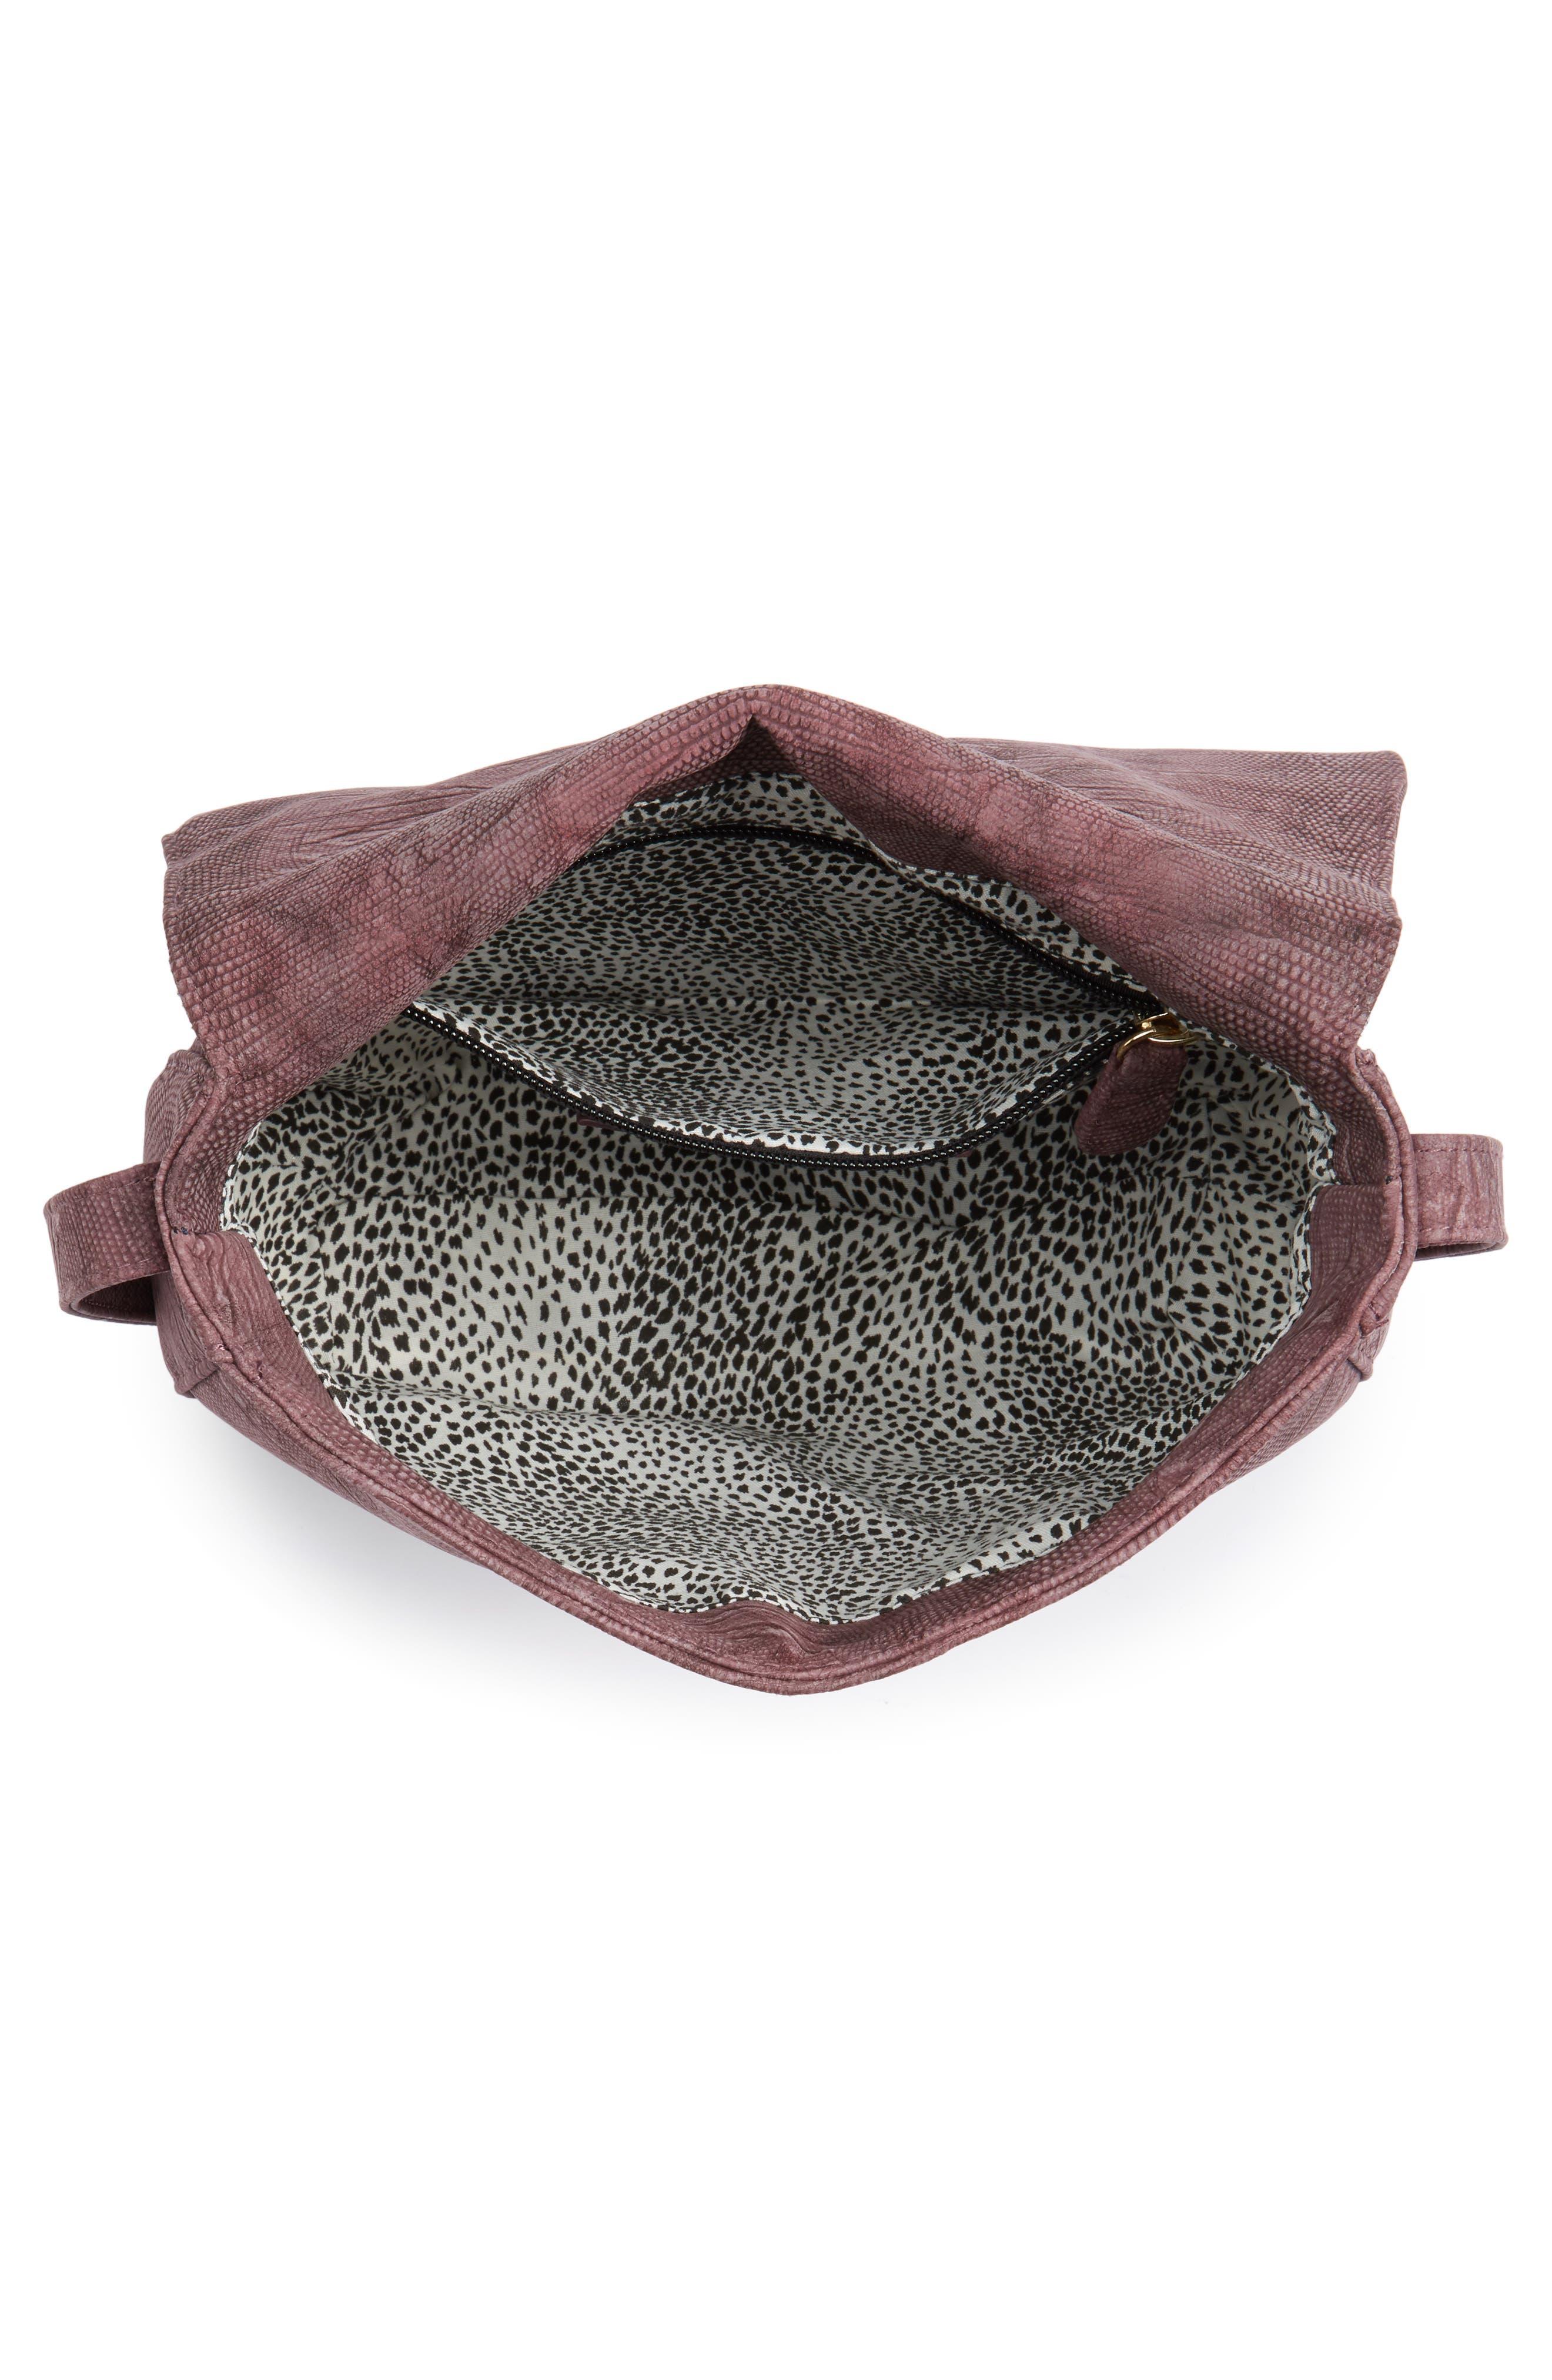 Livvy Faux Leather Crossbody Saddle Bag,                             Alternate thumbnail 12, color,